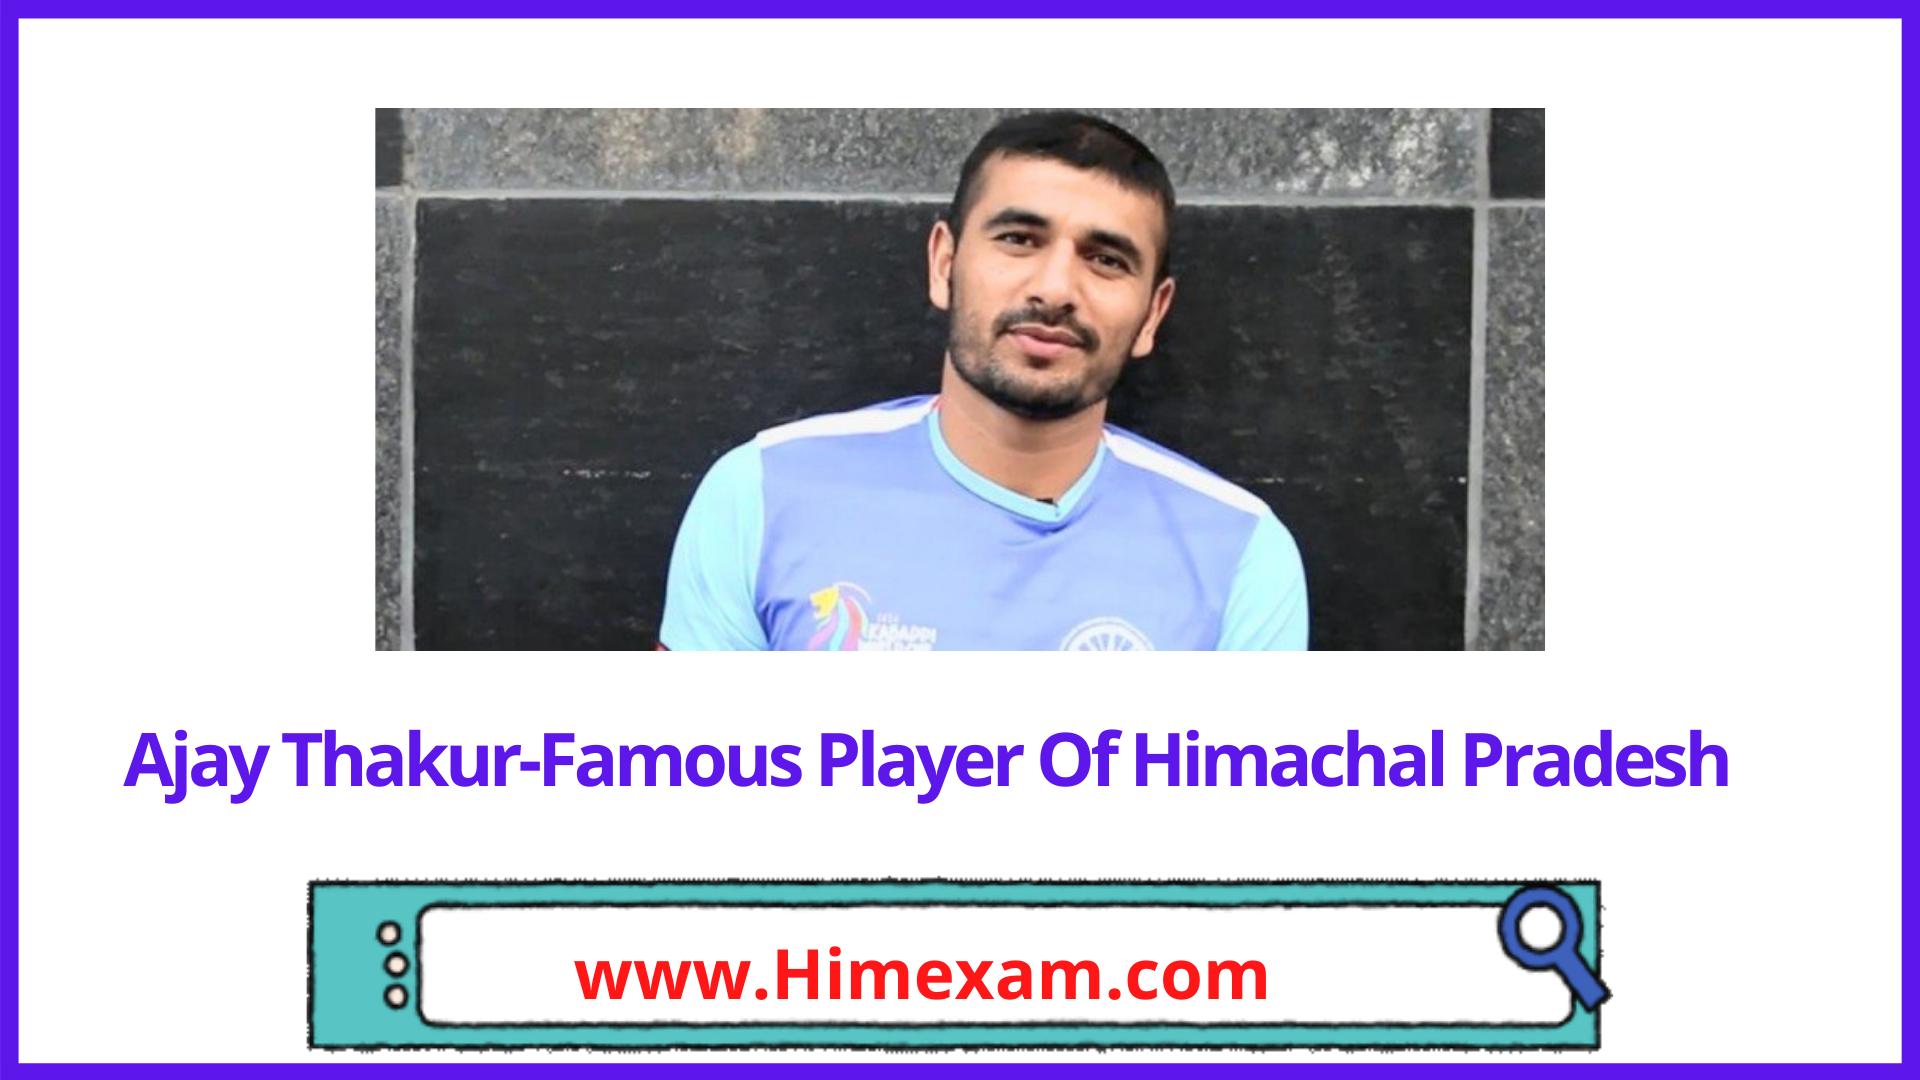 Ajay Thakur-Famous Player Of Himachal Pradesh